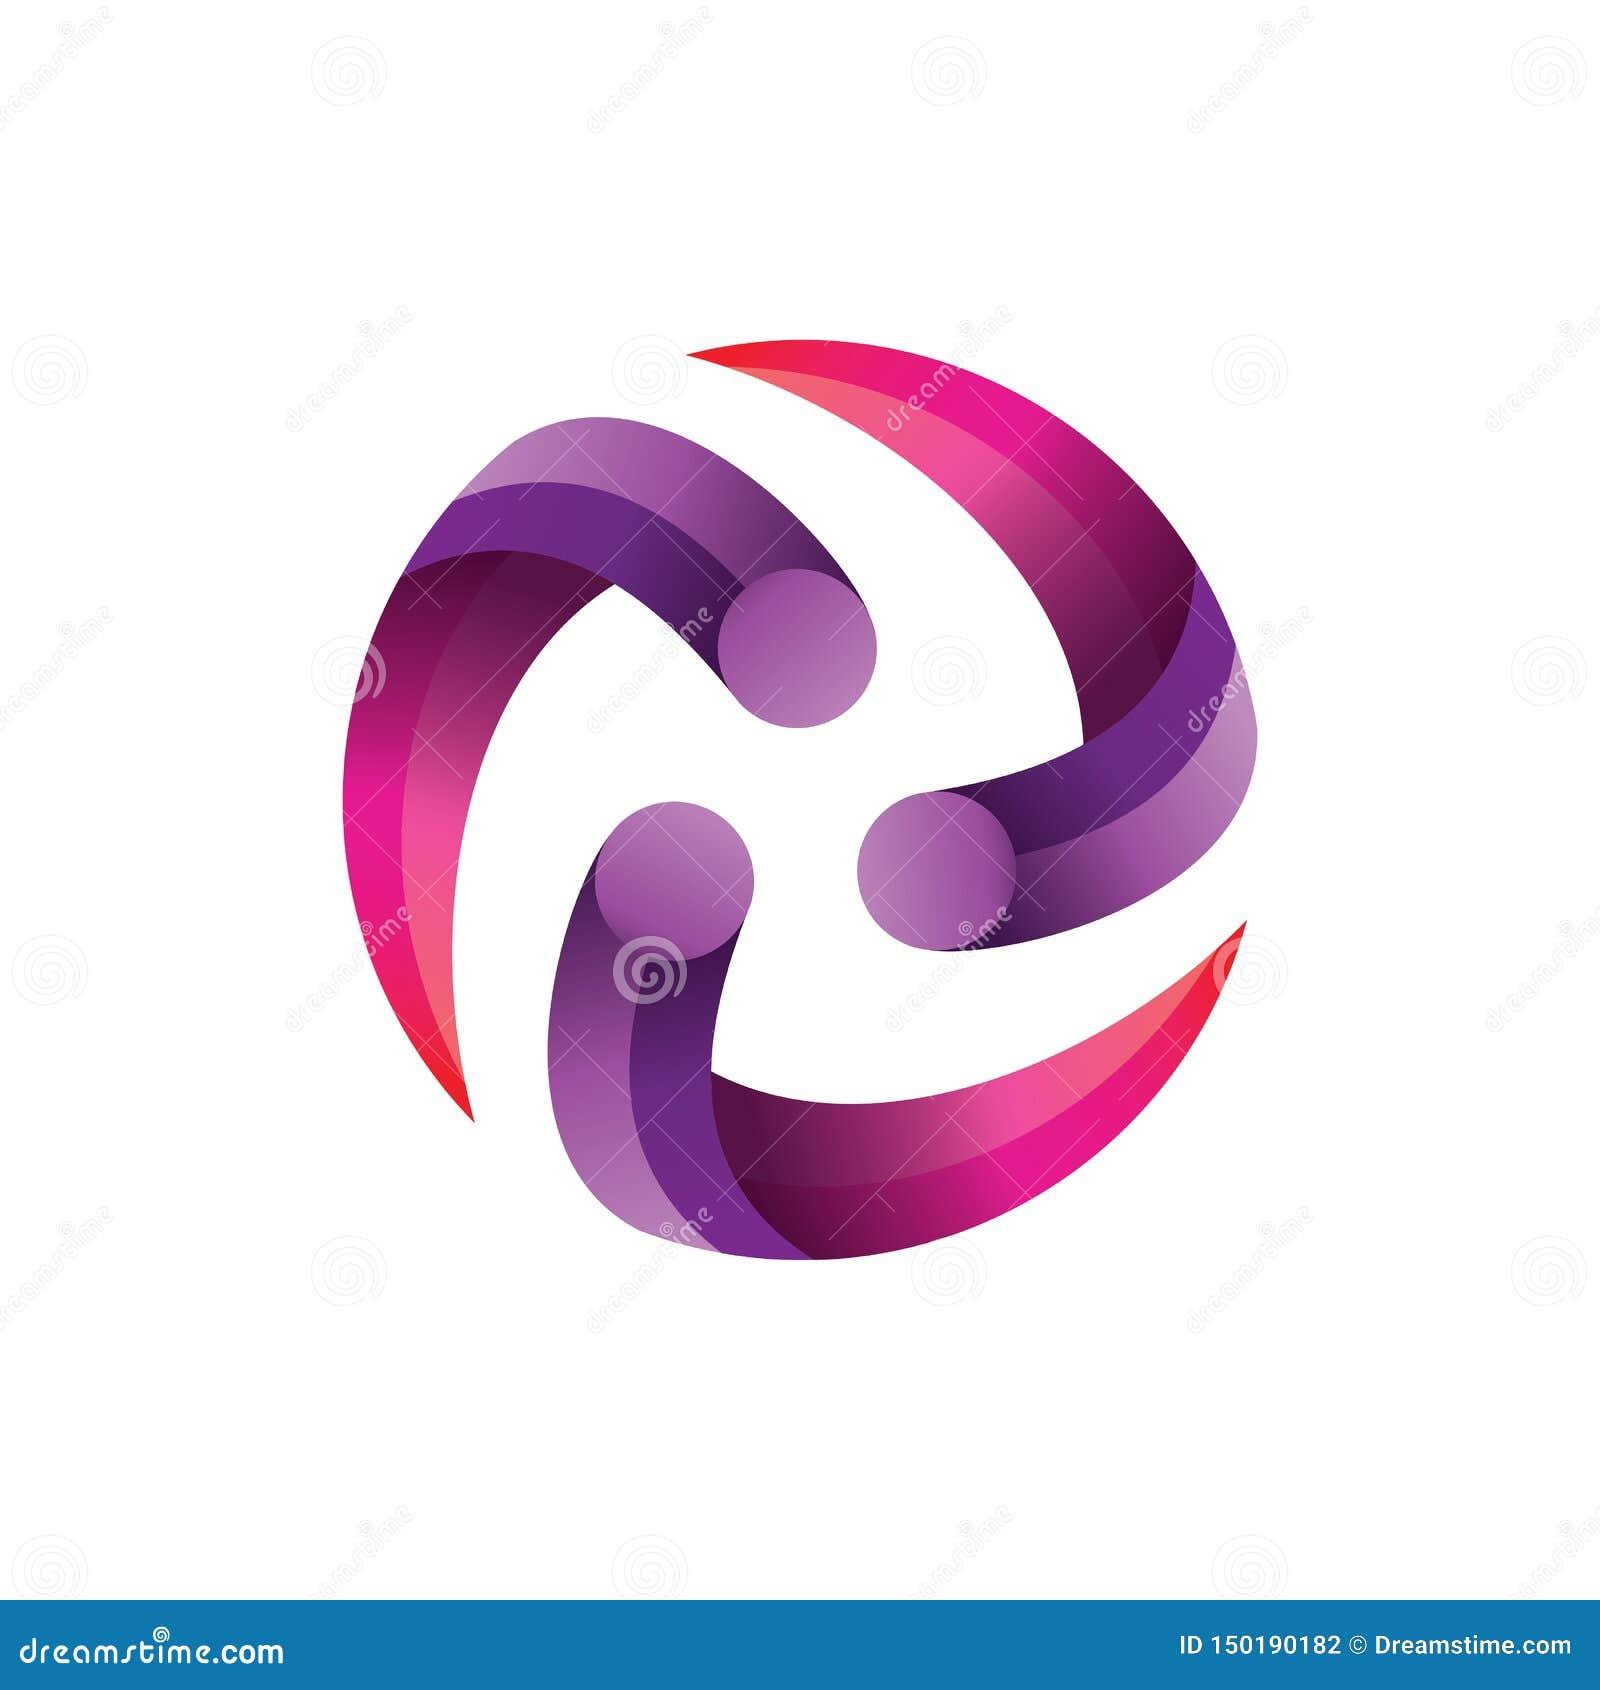 Kreis-Mitte-Steigung Logo Vector